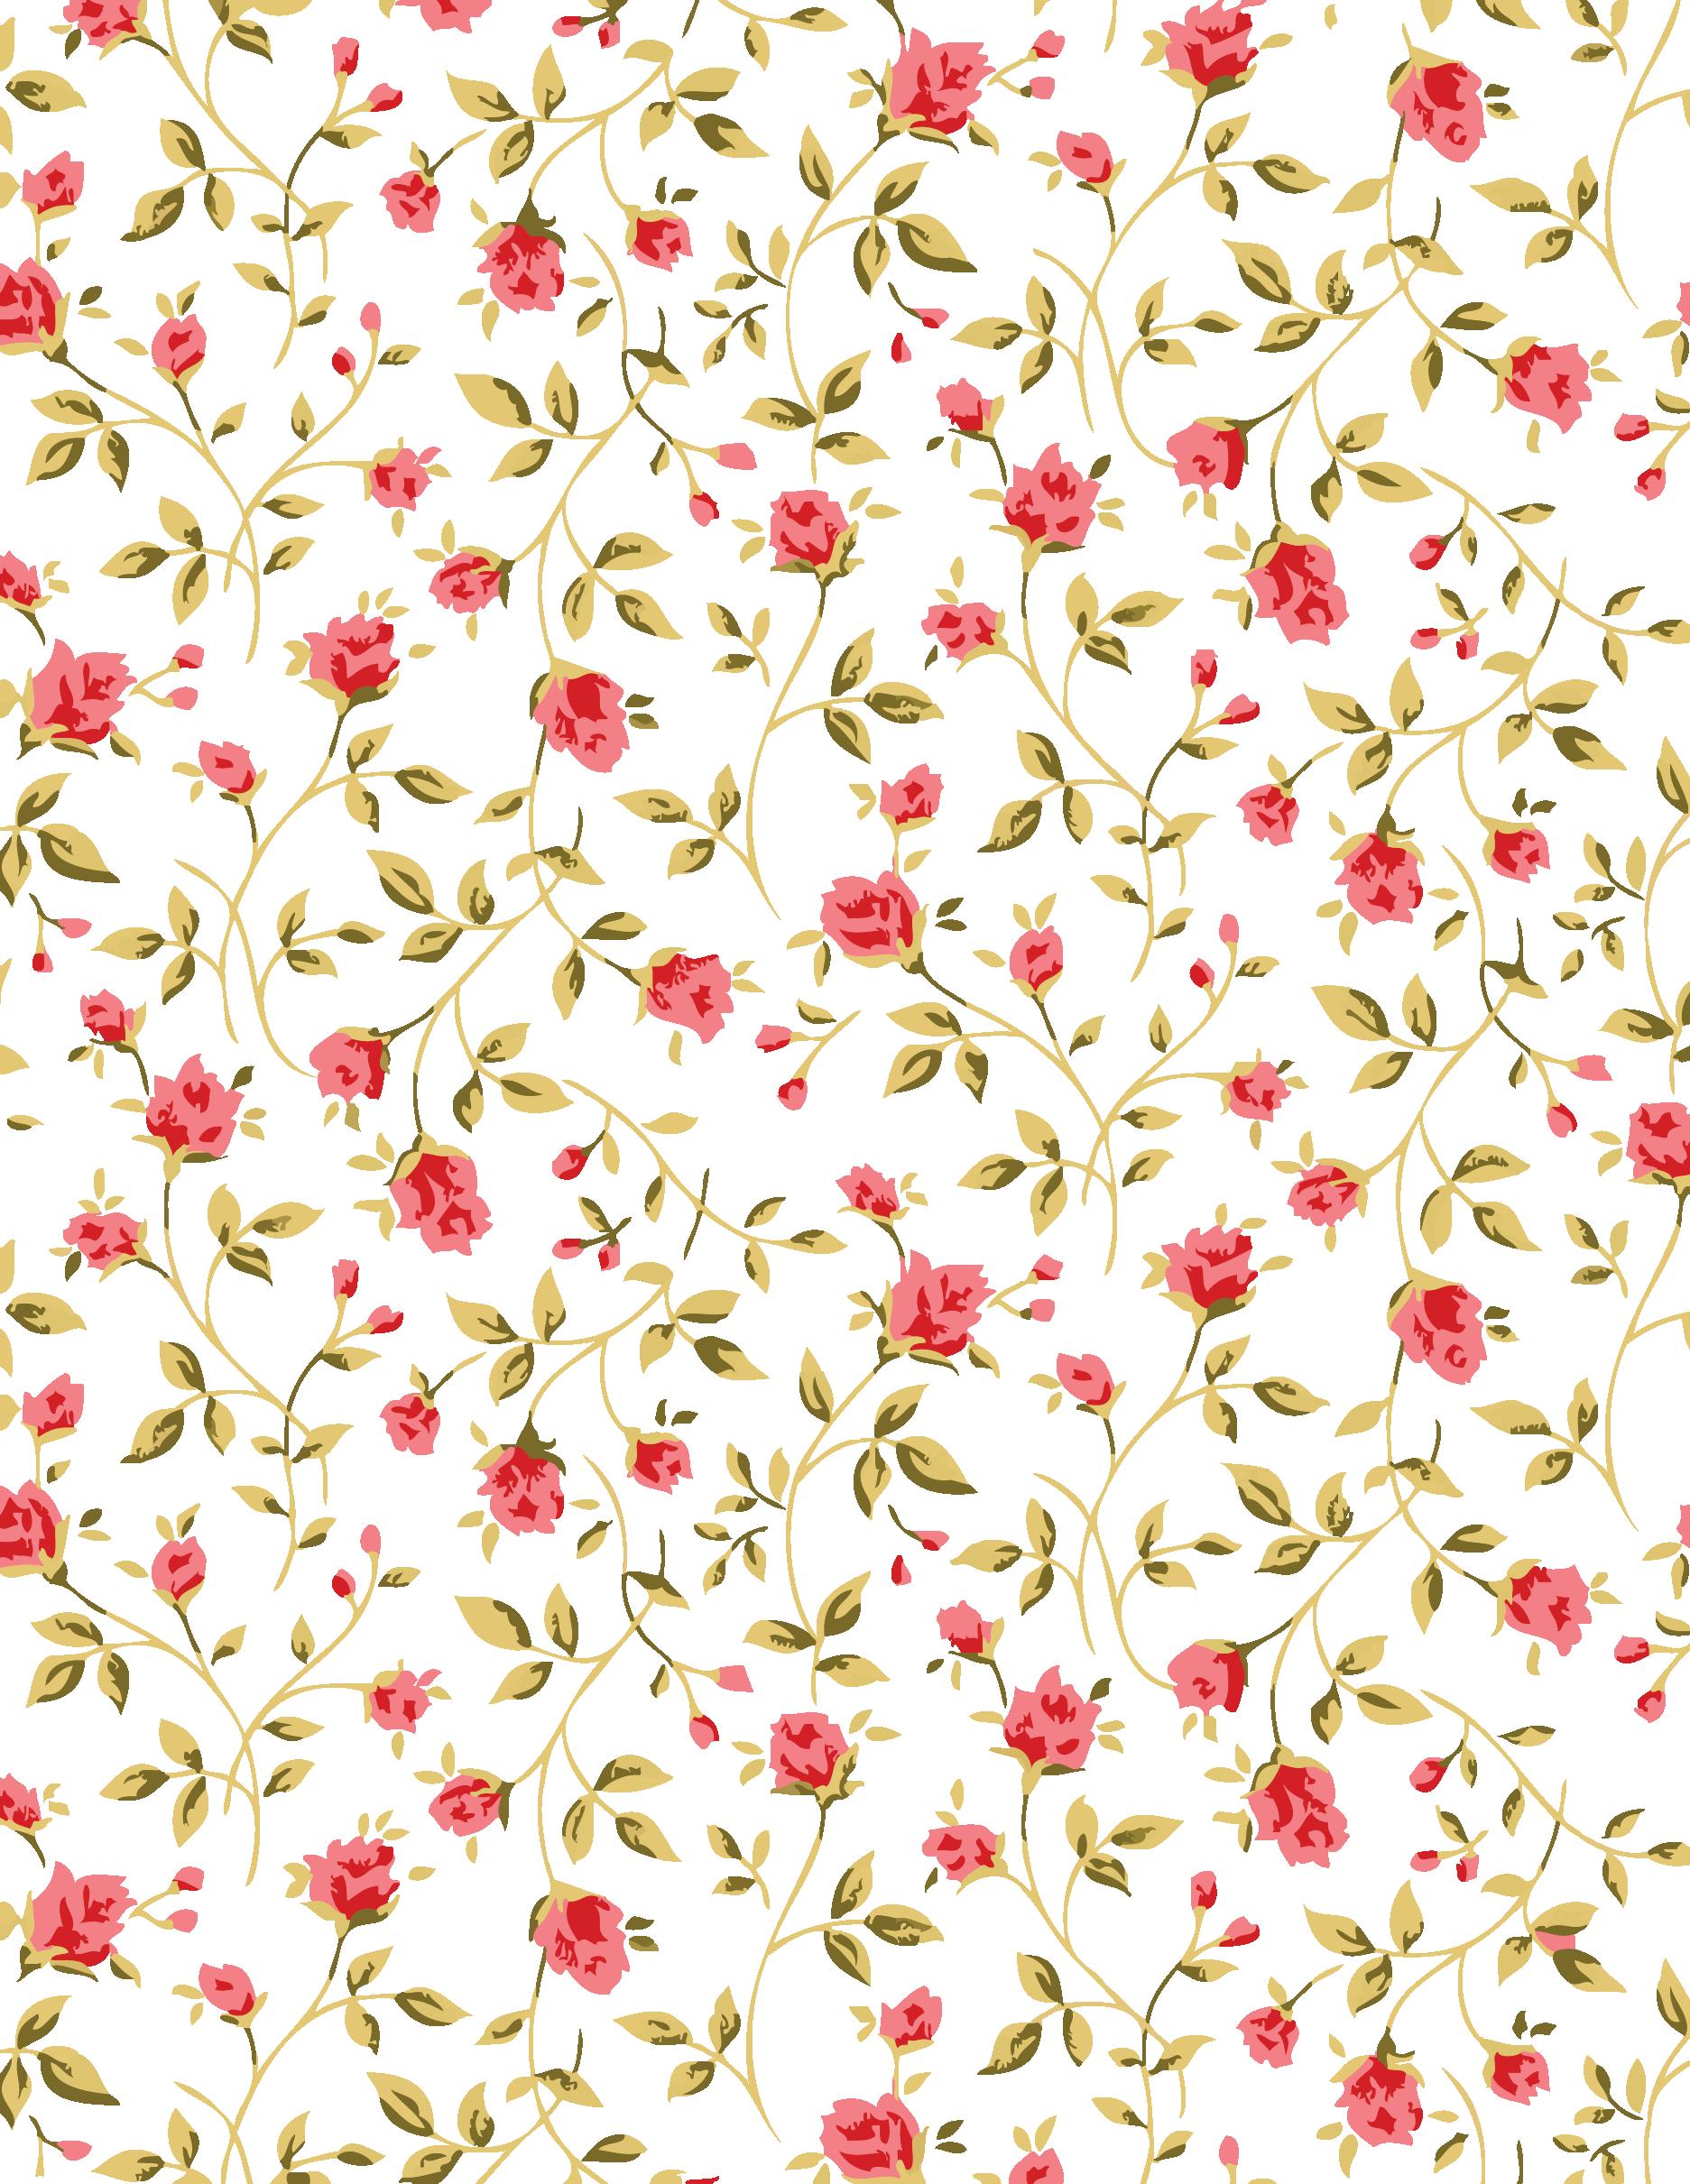 Pin By م خان On Flower Wallpaper In 2020 Vintage Floral Wallpapers Floral Wallpaper Flower Wallpaper